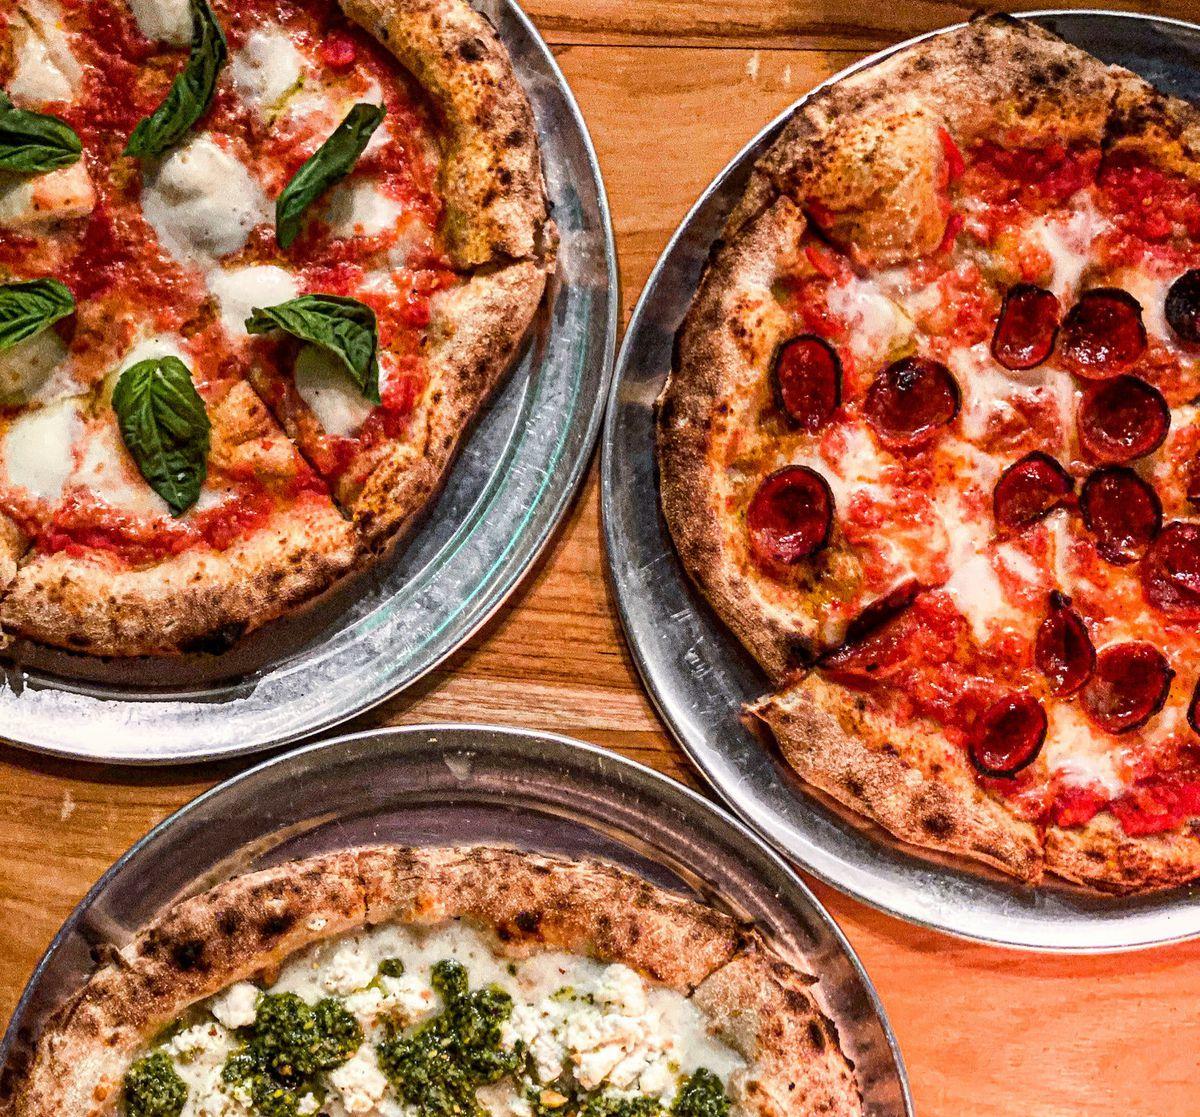 Sourdough pizza at Grá in Echo Park